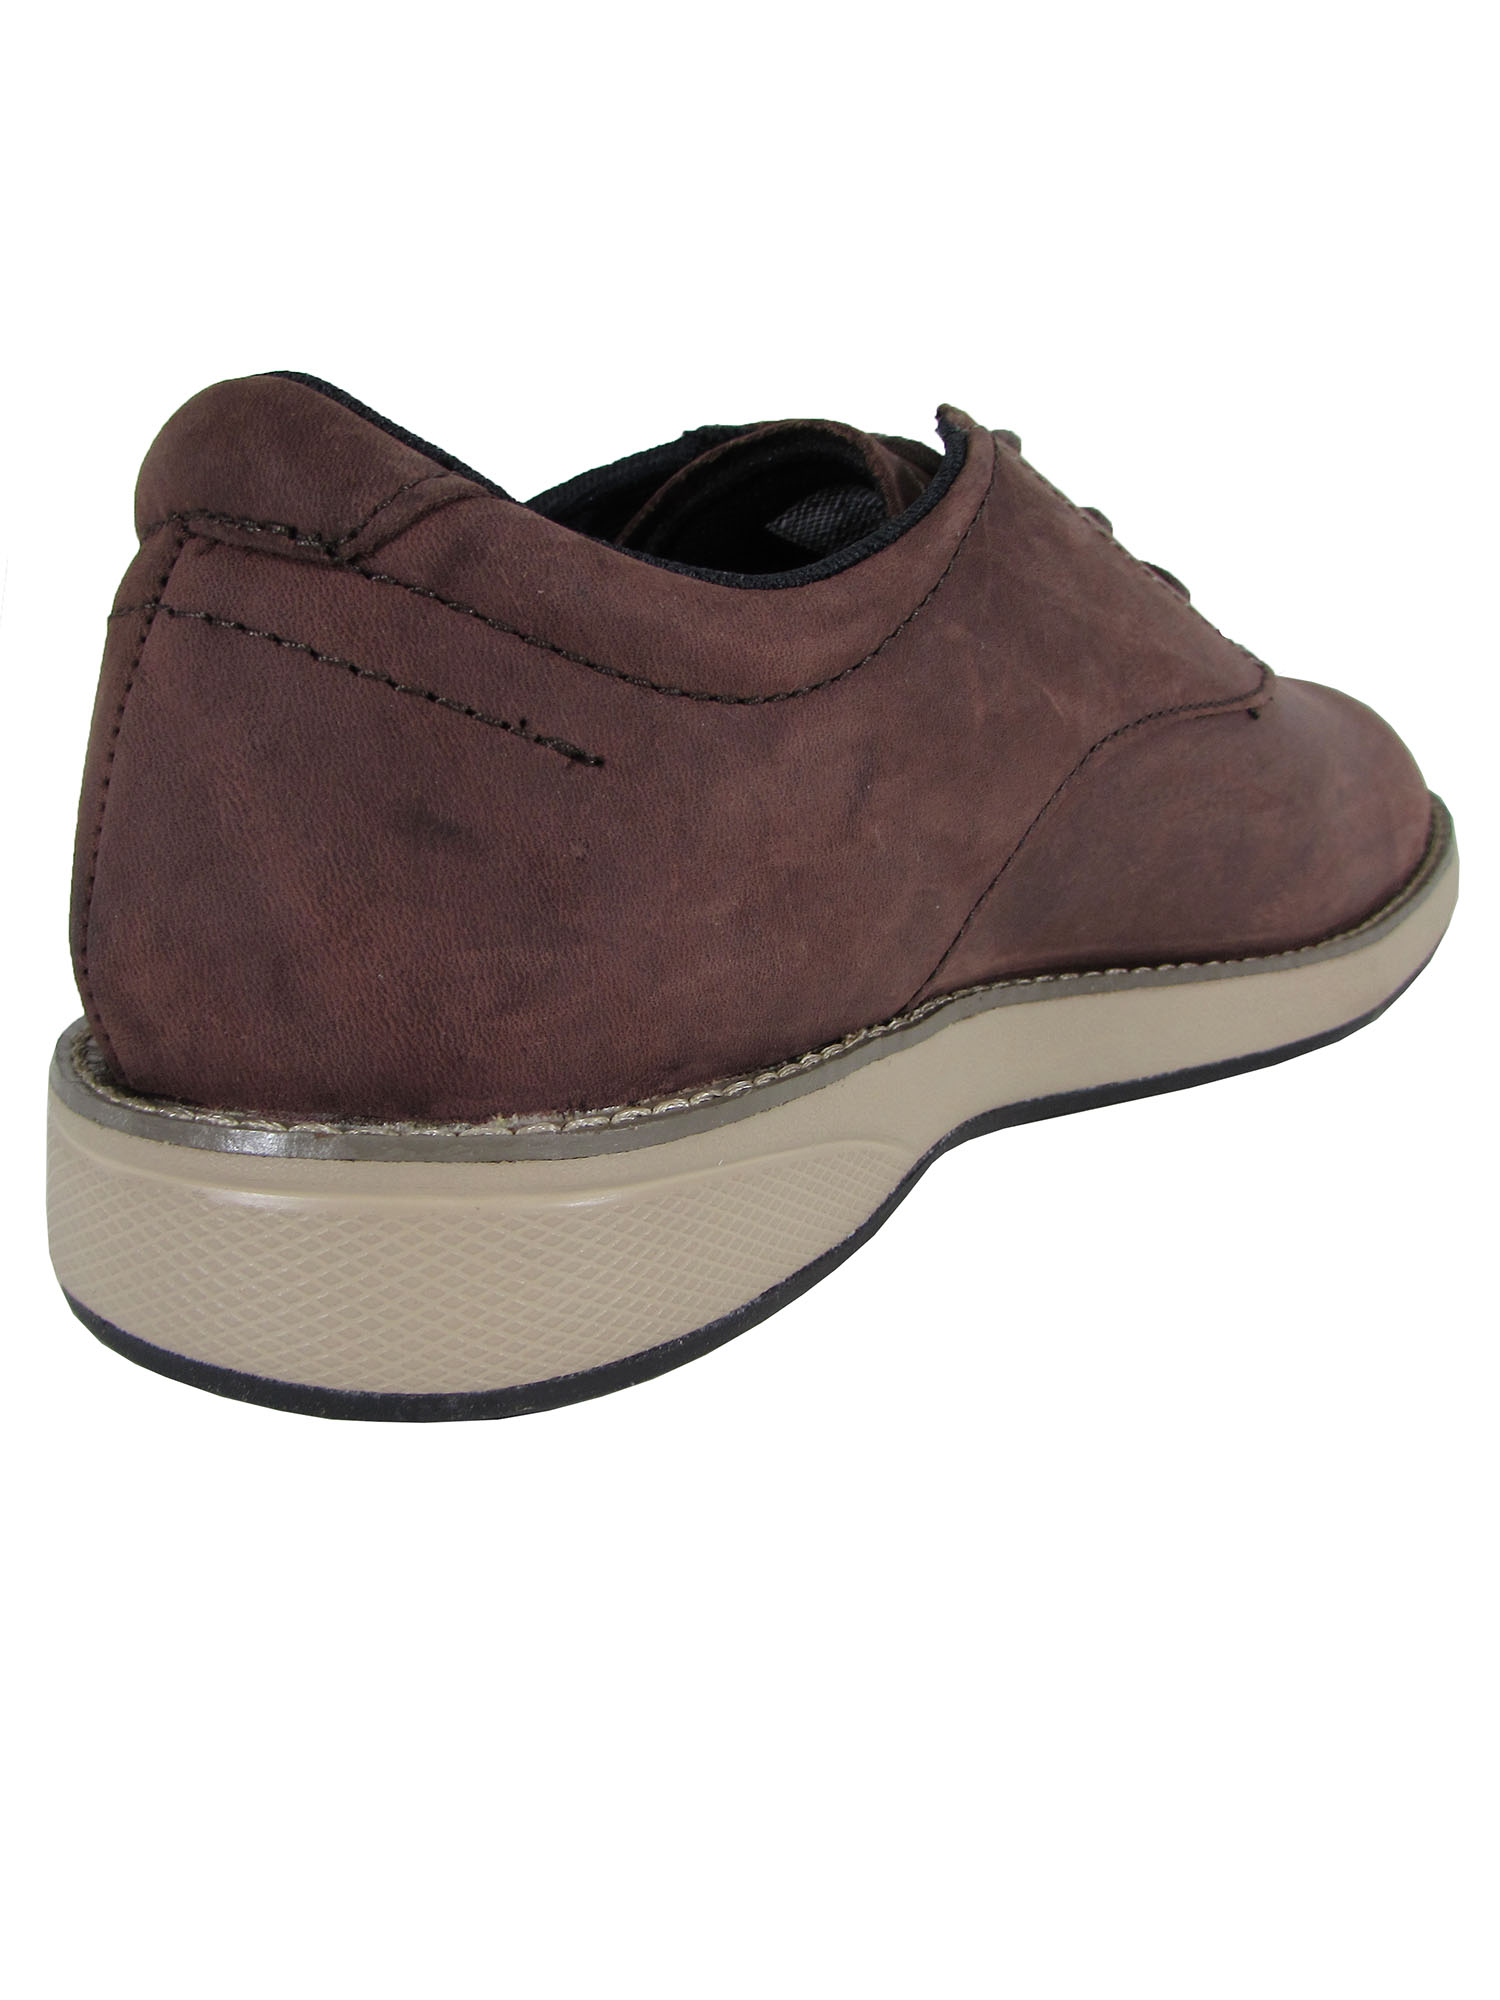 Crocs-Mens-Foray-Lace-Up-Oxford-Shoes thumbnail 7